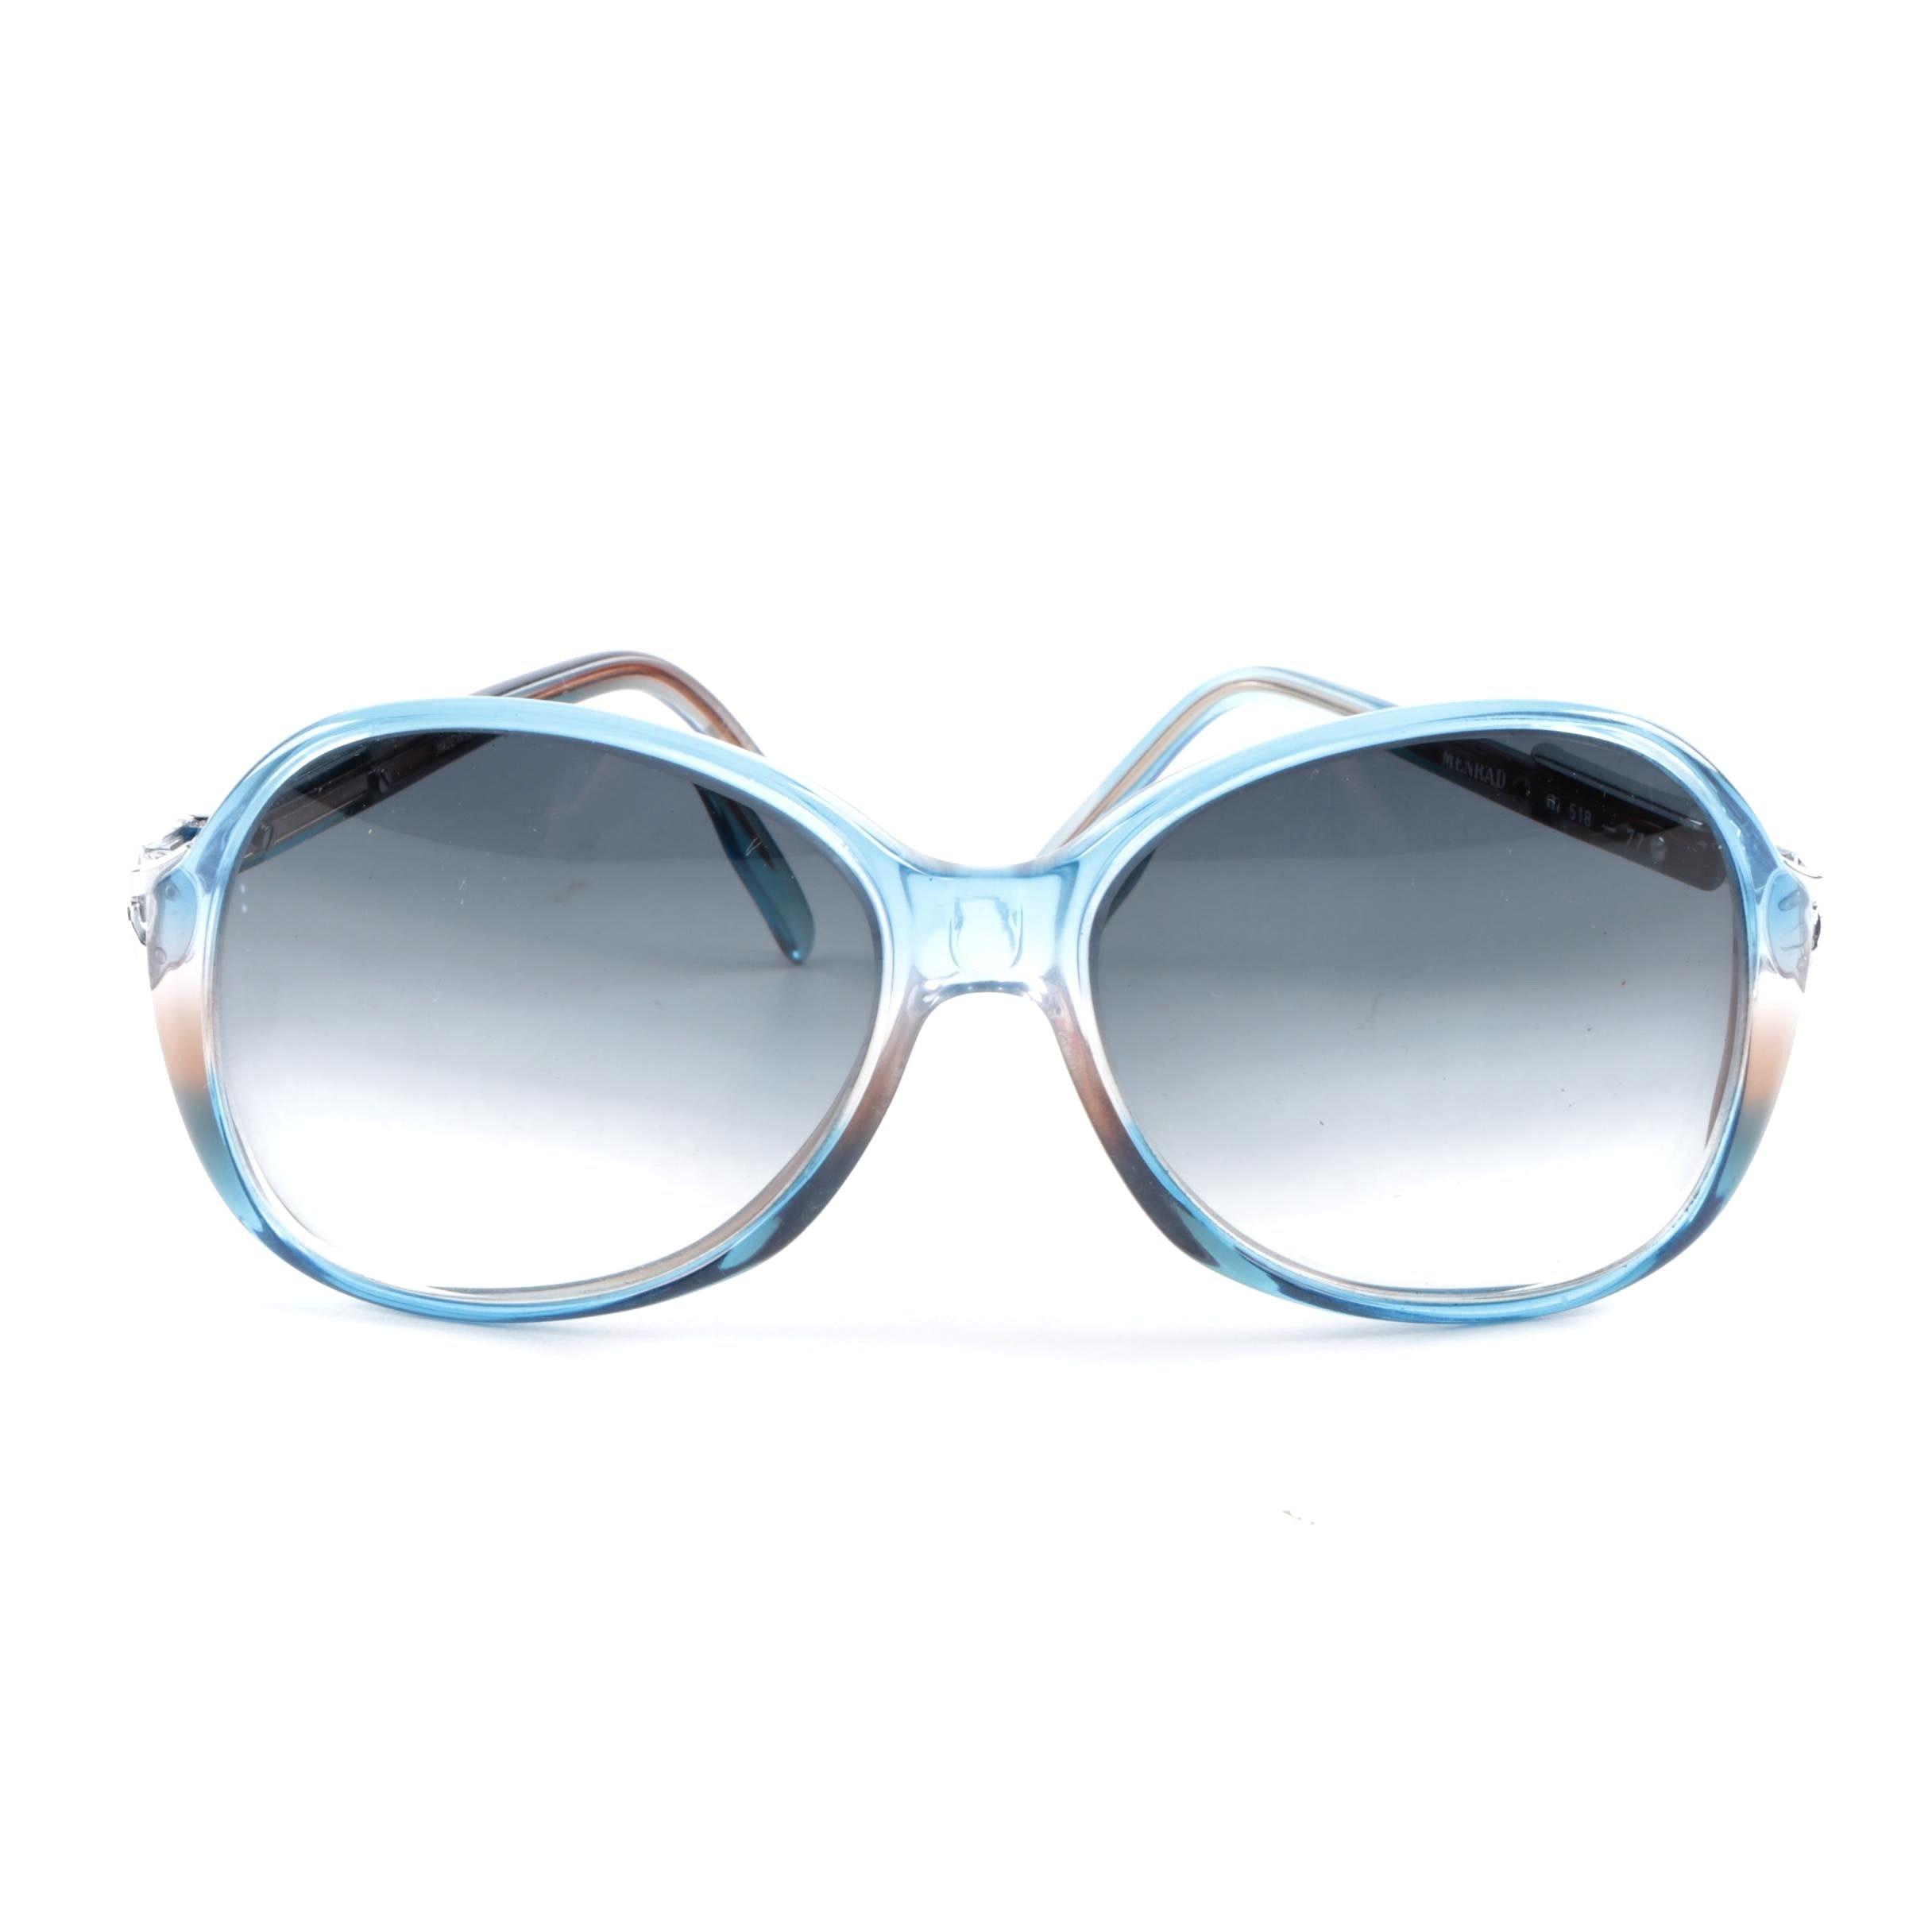 1980s Menrad Cobalt Blue 518-77 Sunglasses